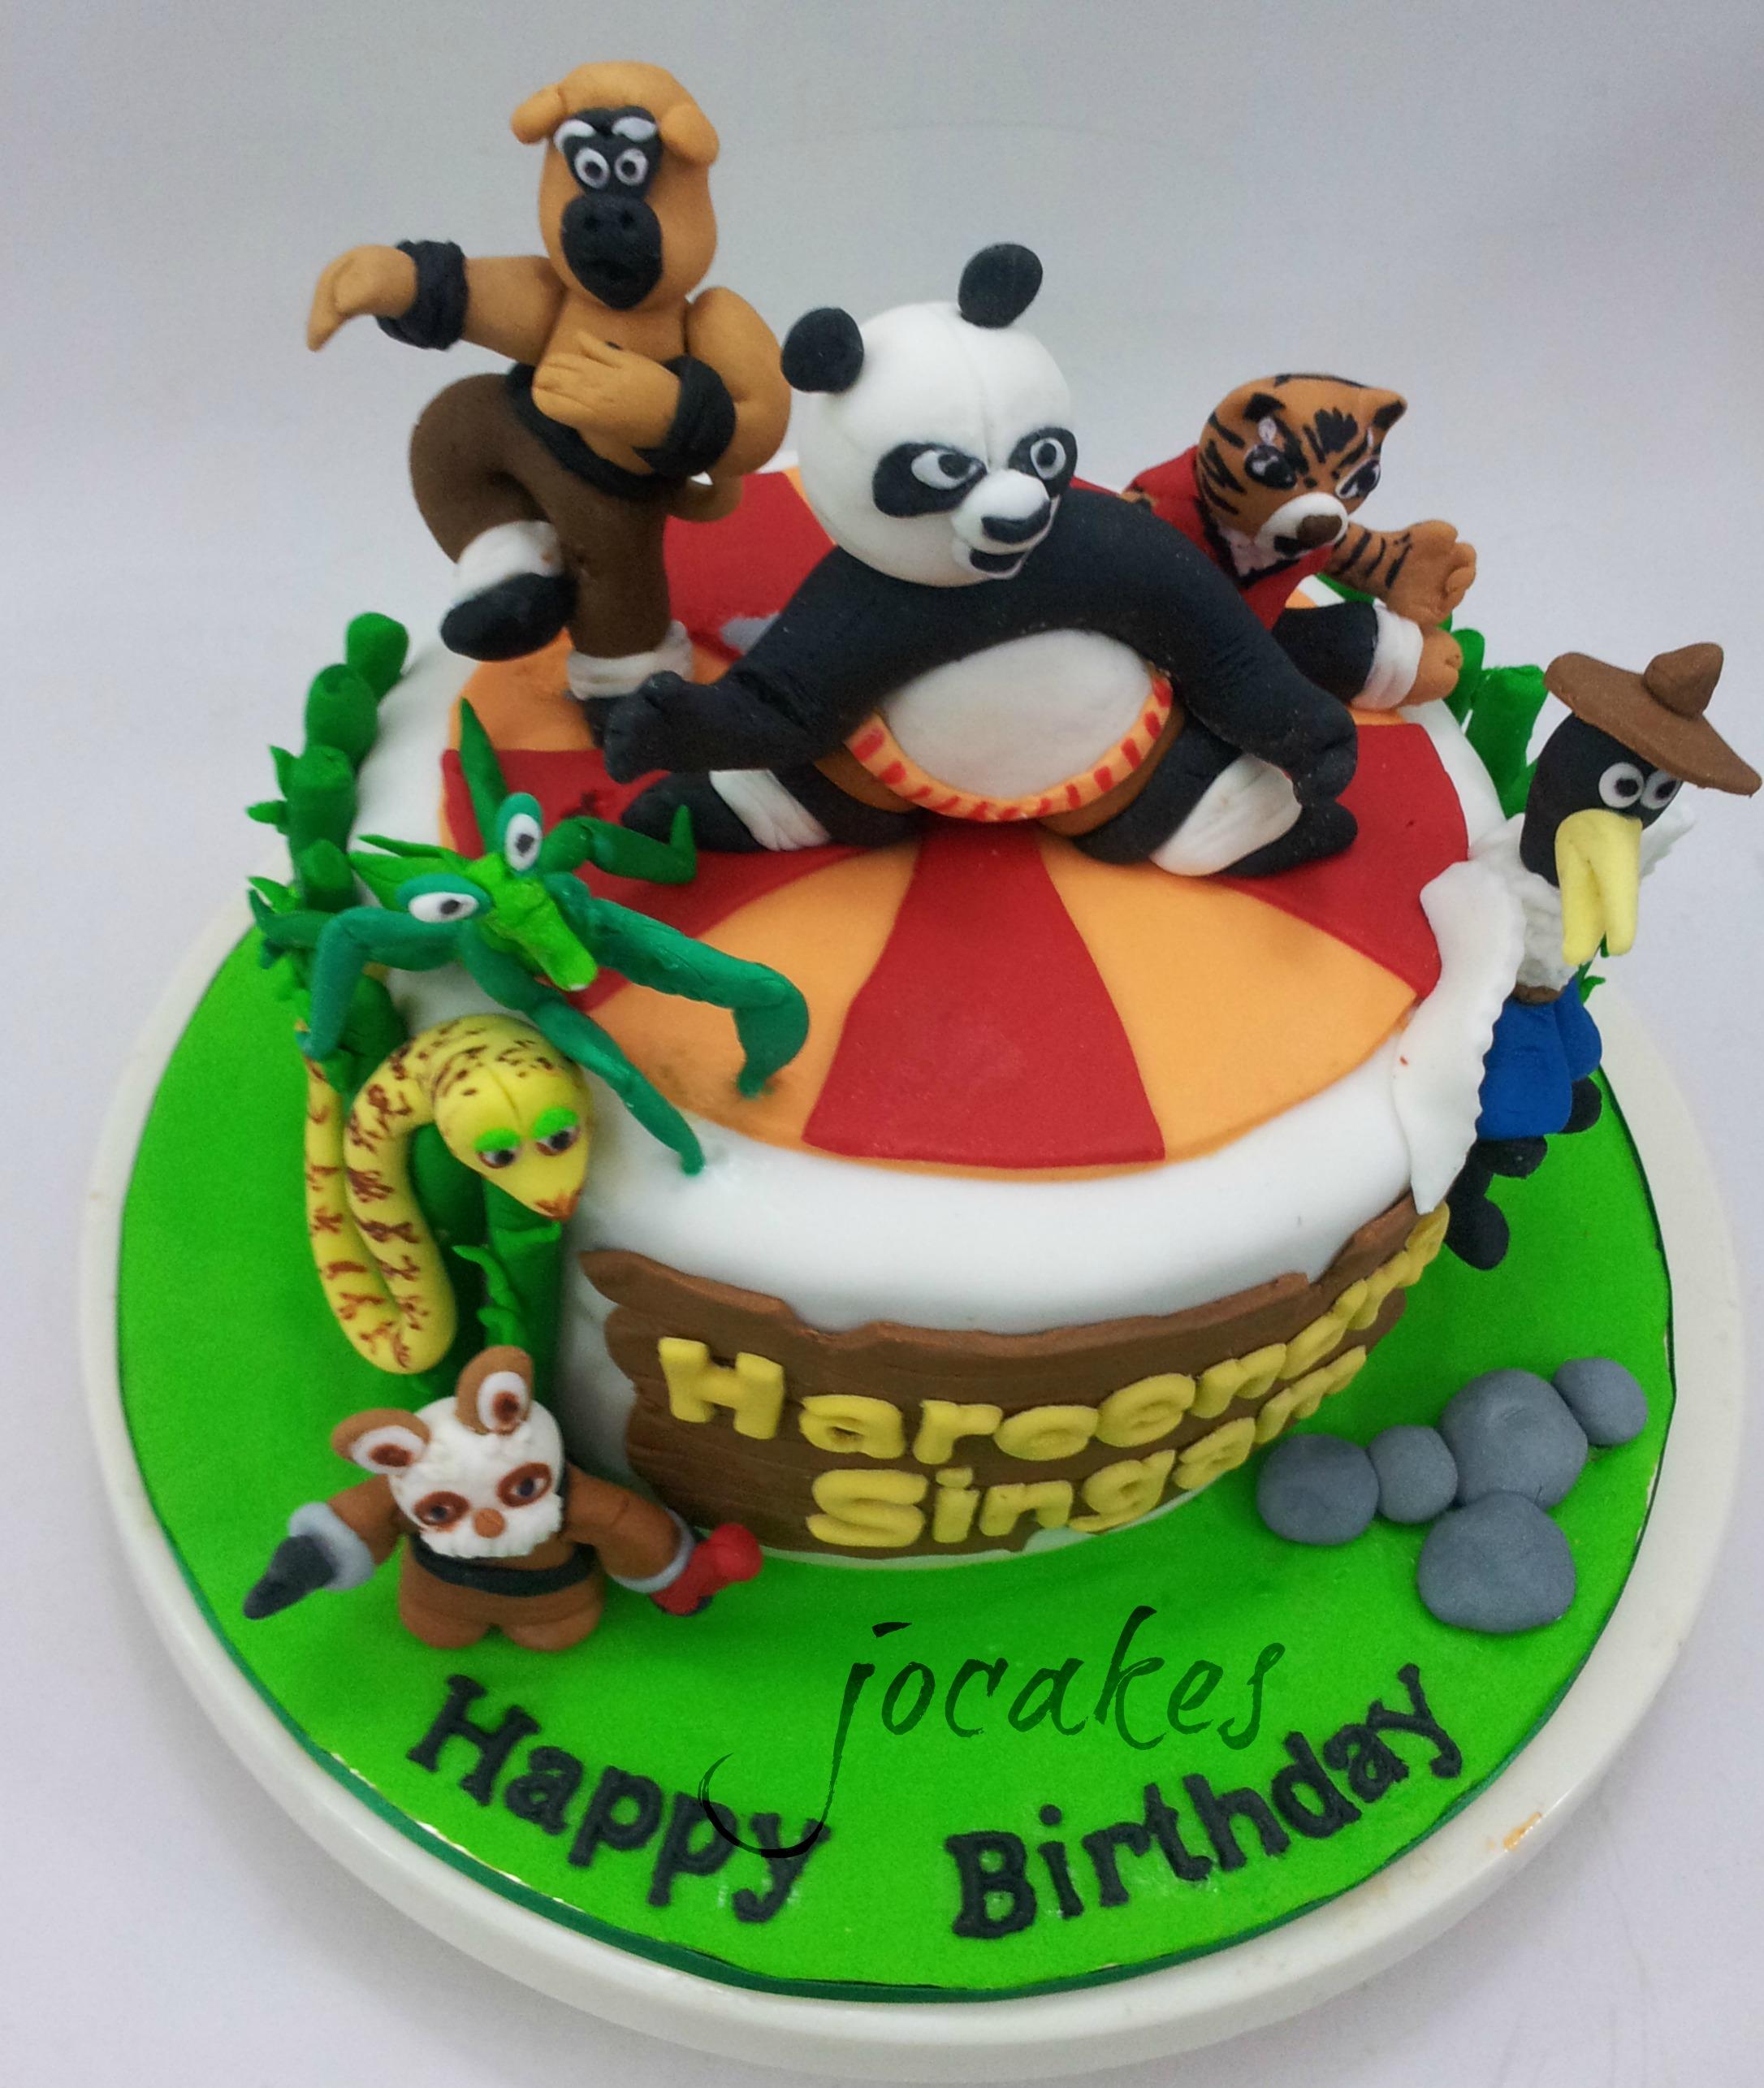 Stupendous 11 Kung Fu Panda Birthday Cakes Photo Kung Fu Panda Birthday Funny Birthday Cards Online Alyptdamsfinfo